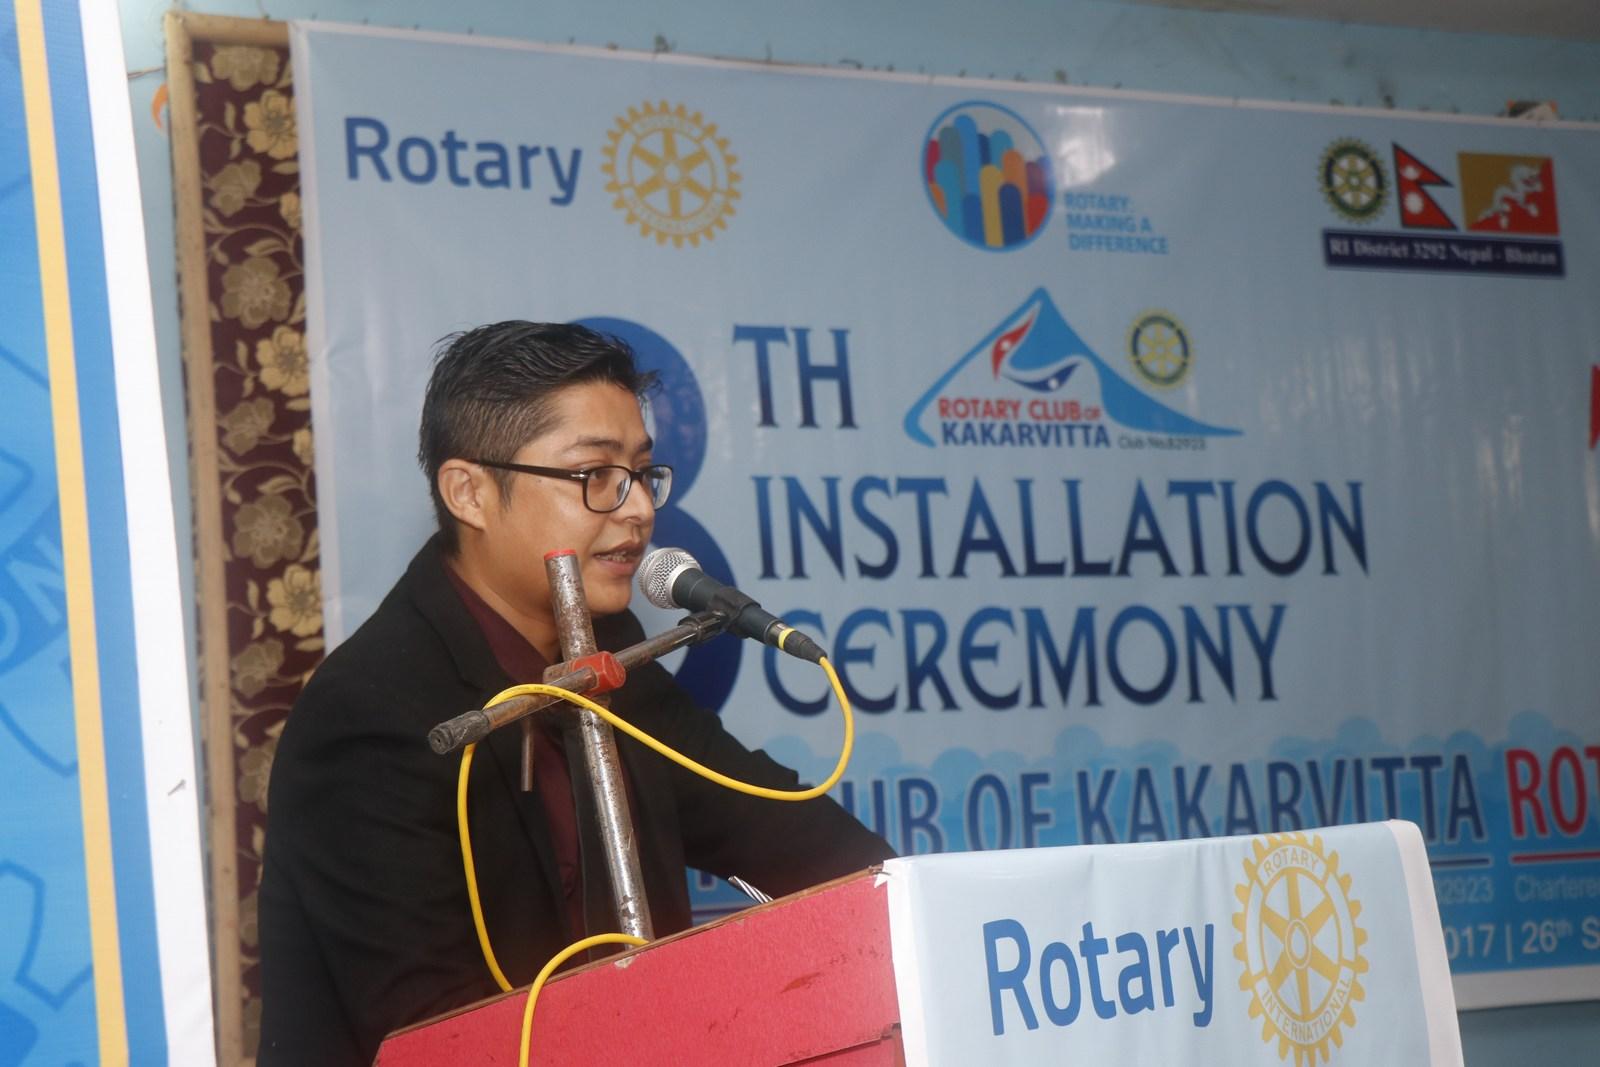 8th-Installation-Ceremony-Rotary-Club-of-Kakarvitta-1